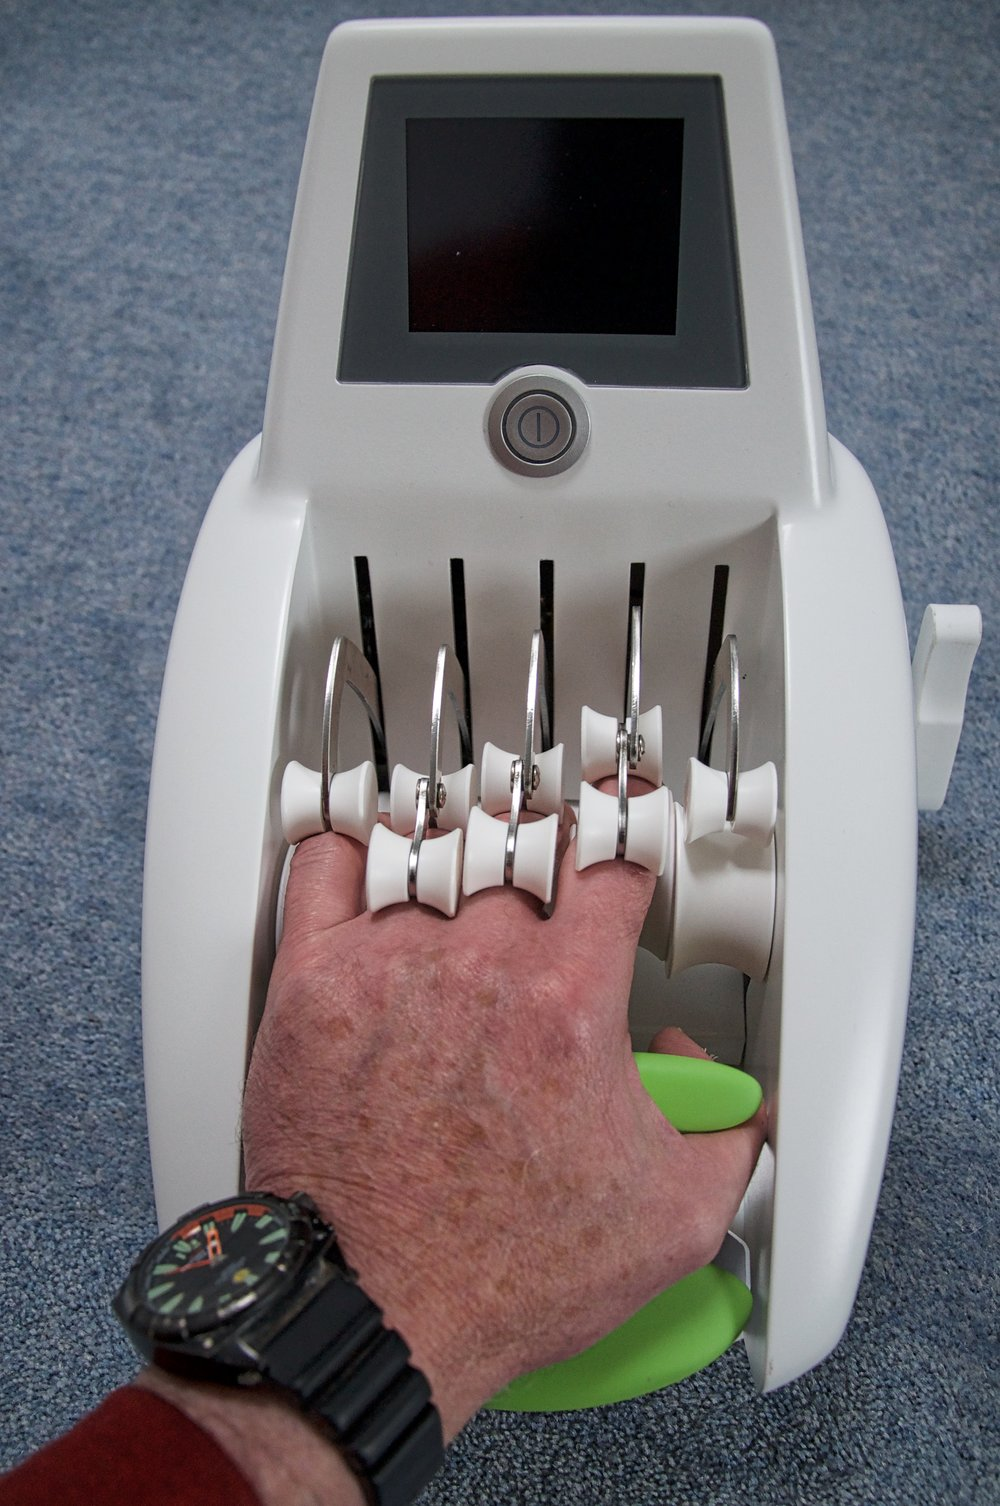 RehaDigit is an effective hand rehab device